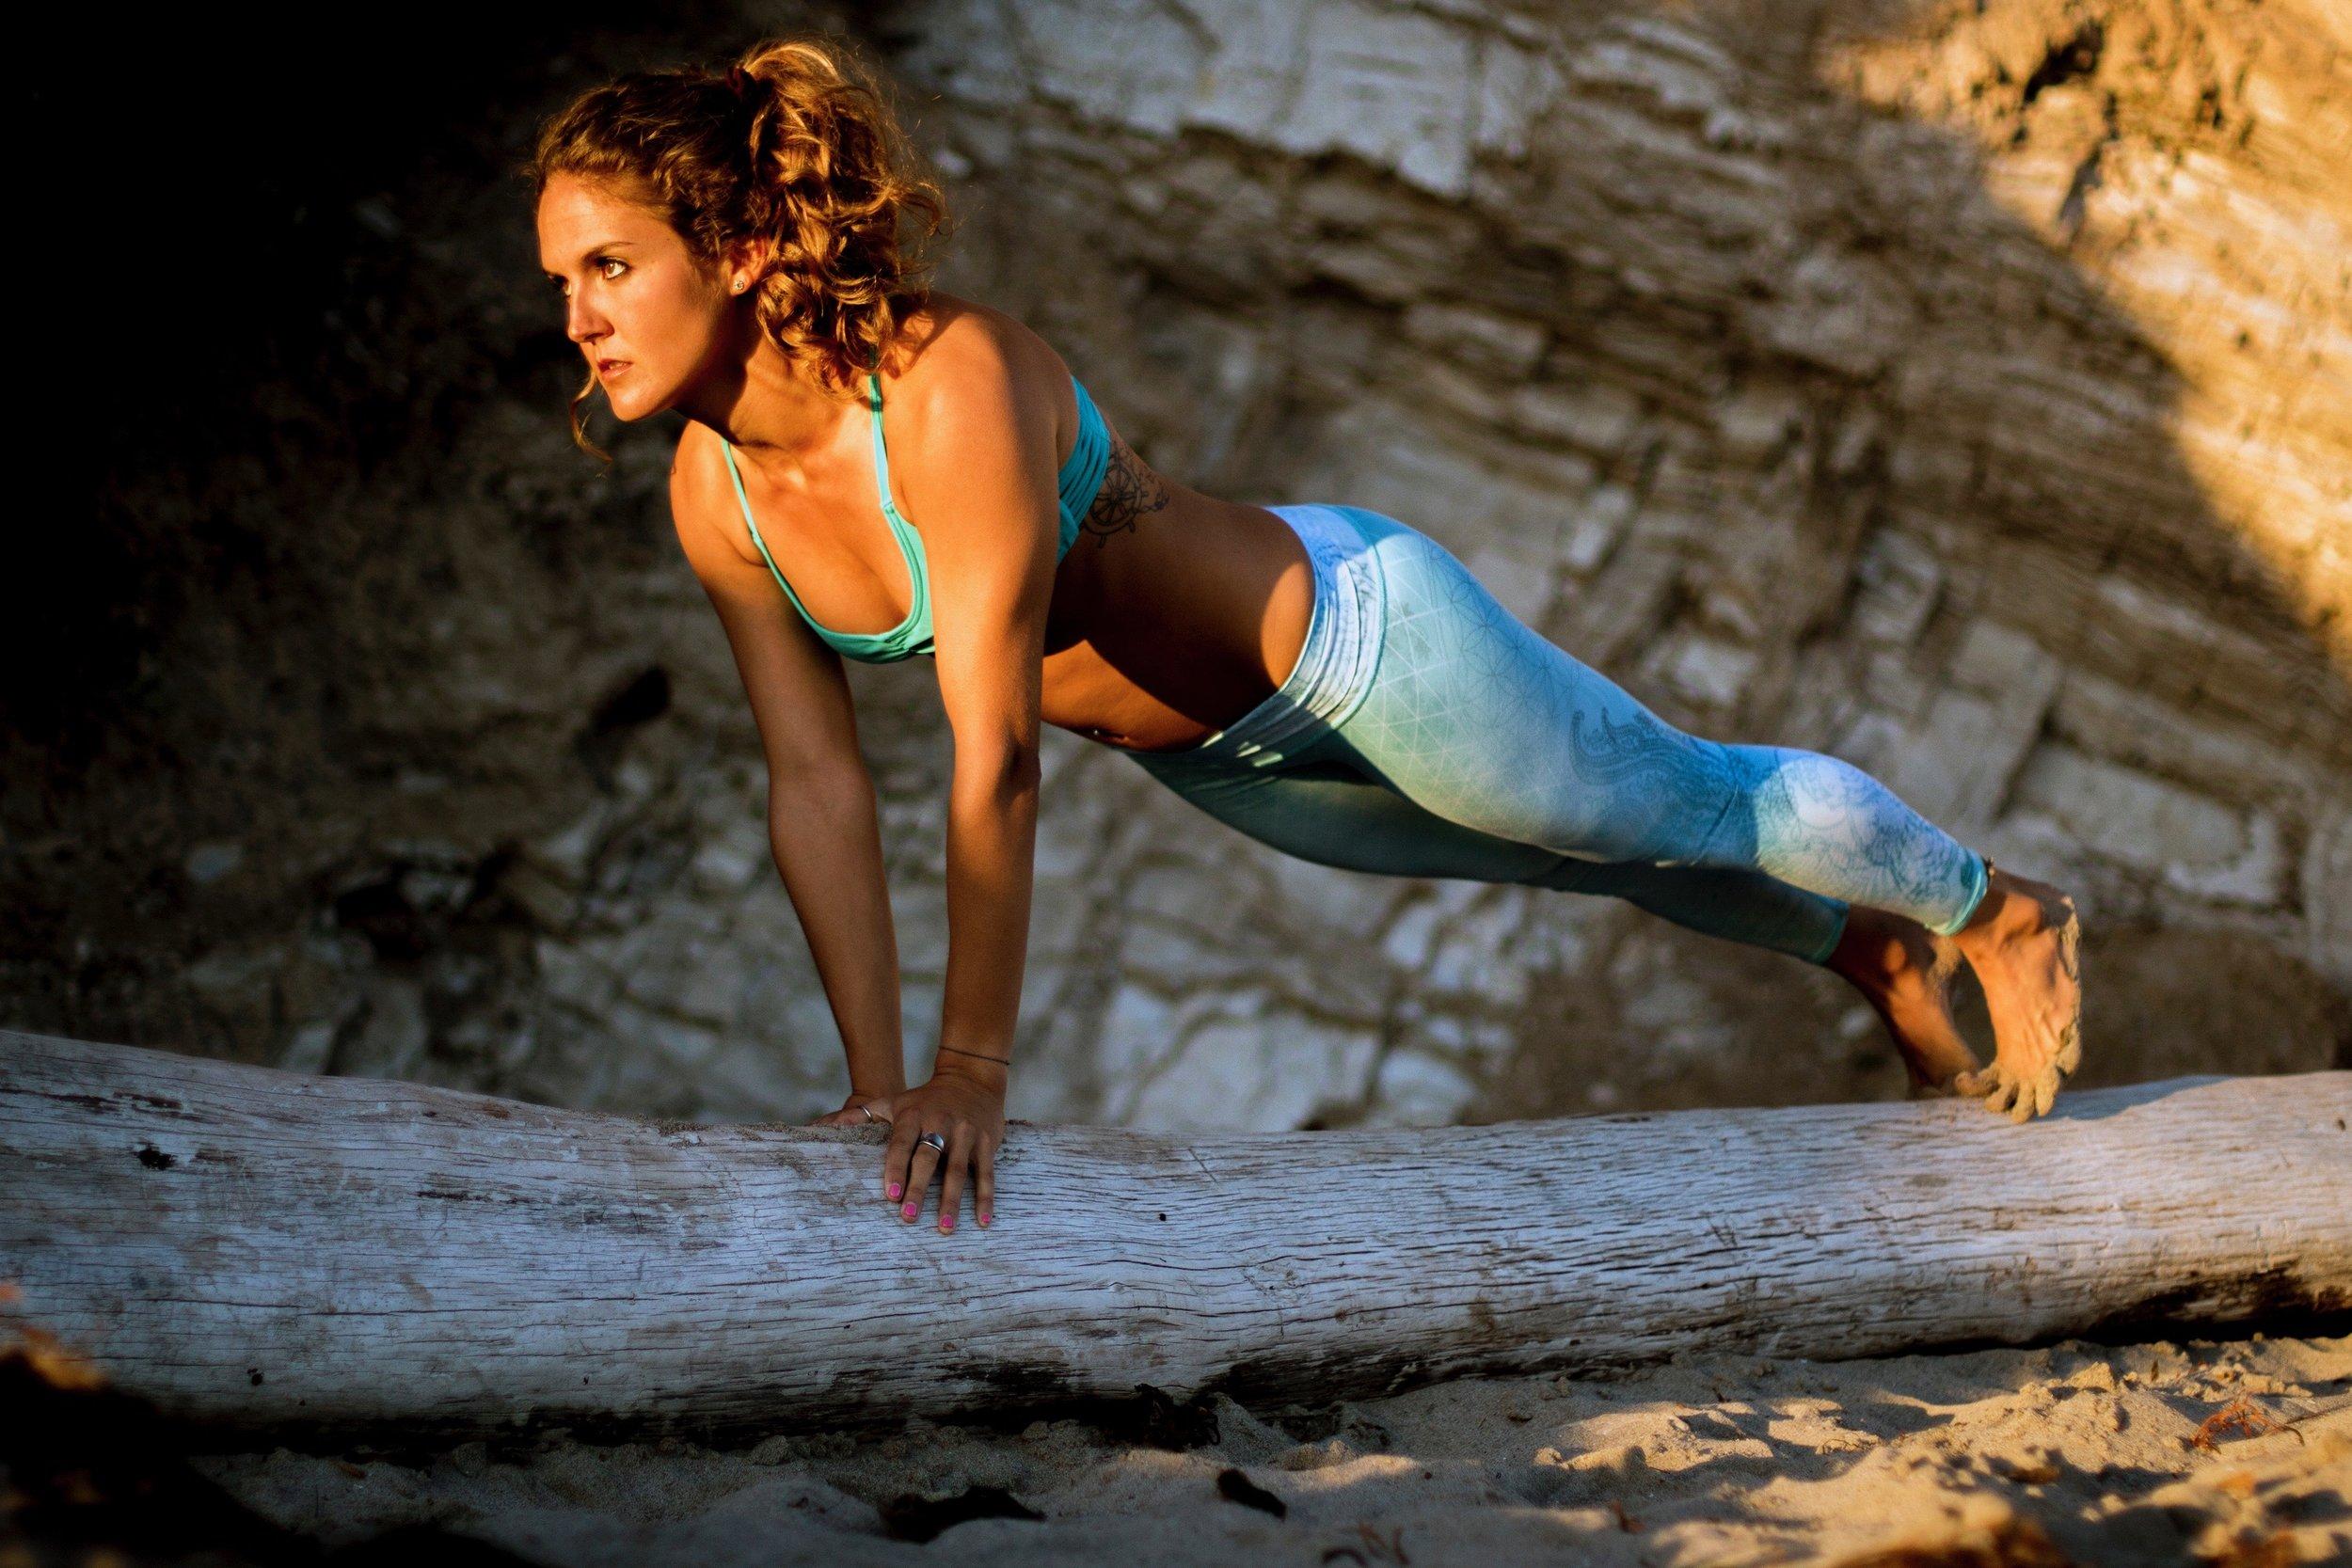 A balancing act of strength and femininity.